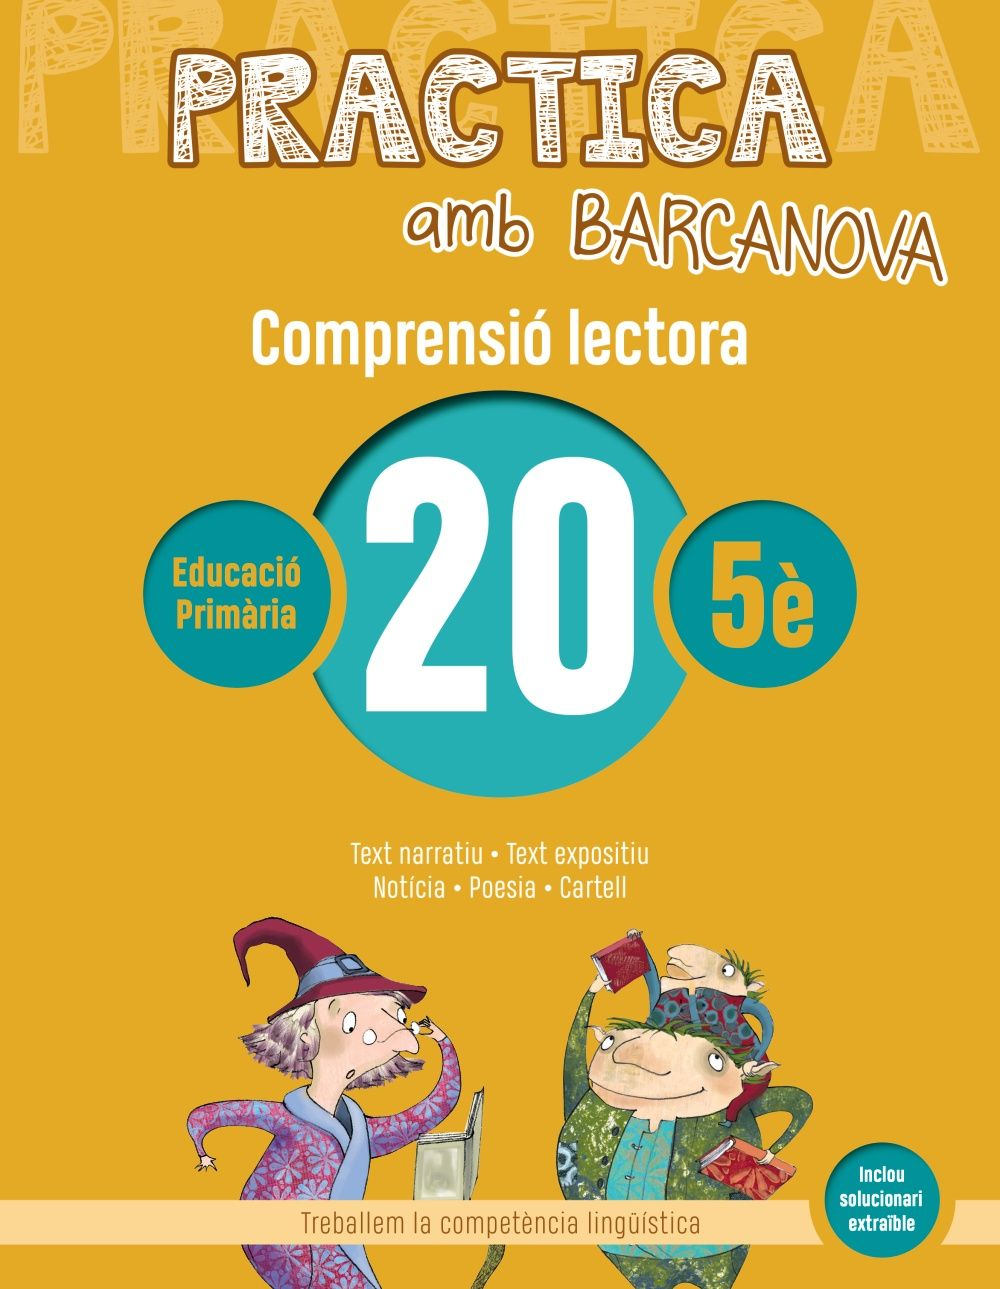 PRACTICA COMPRENSIO LECTORA20